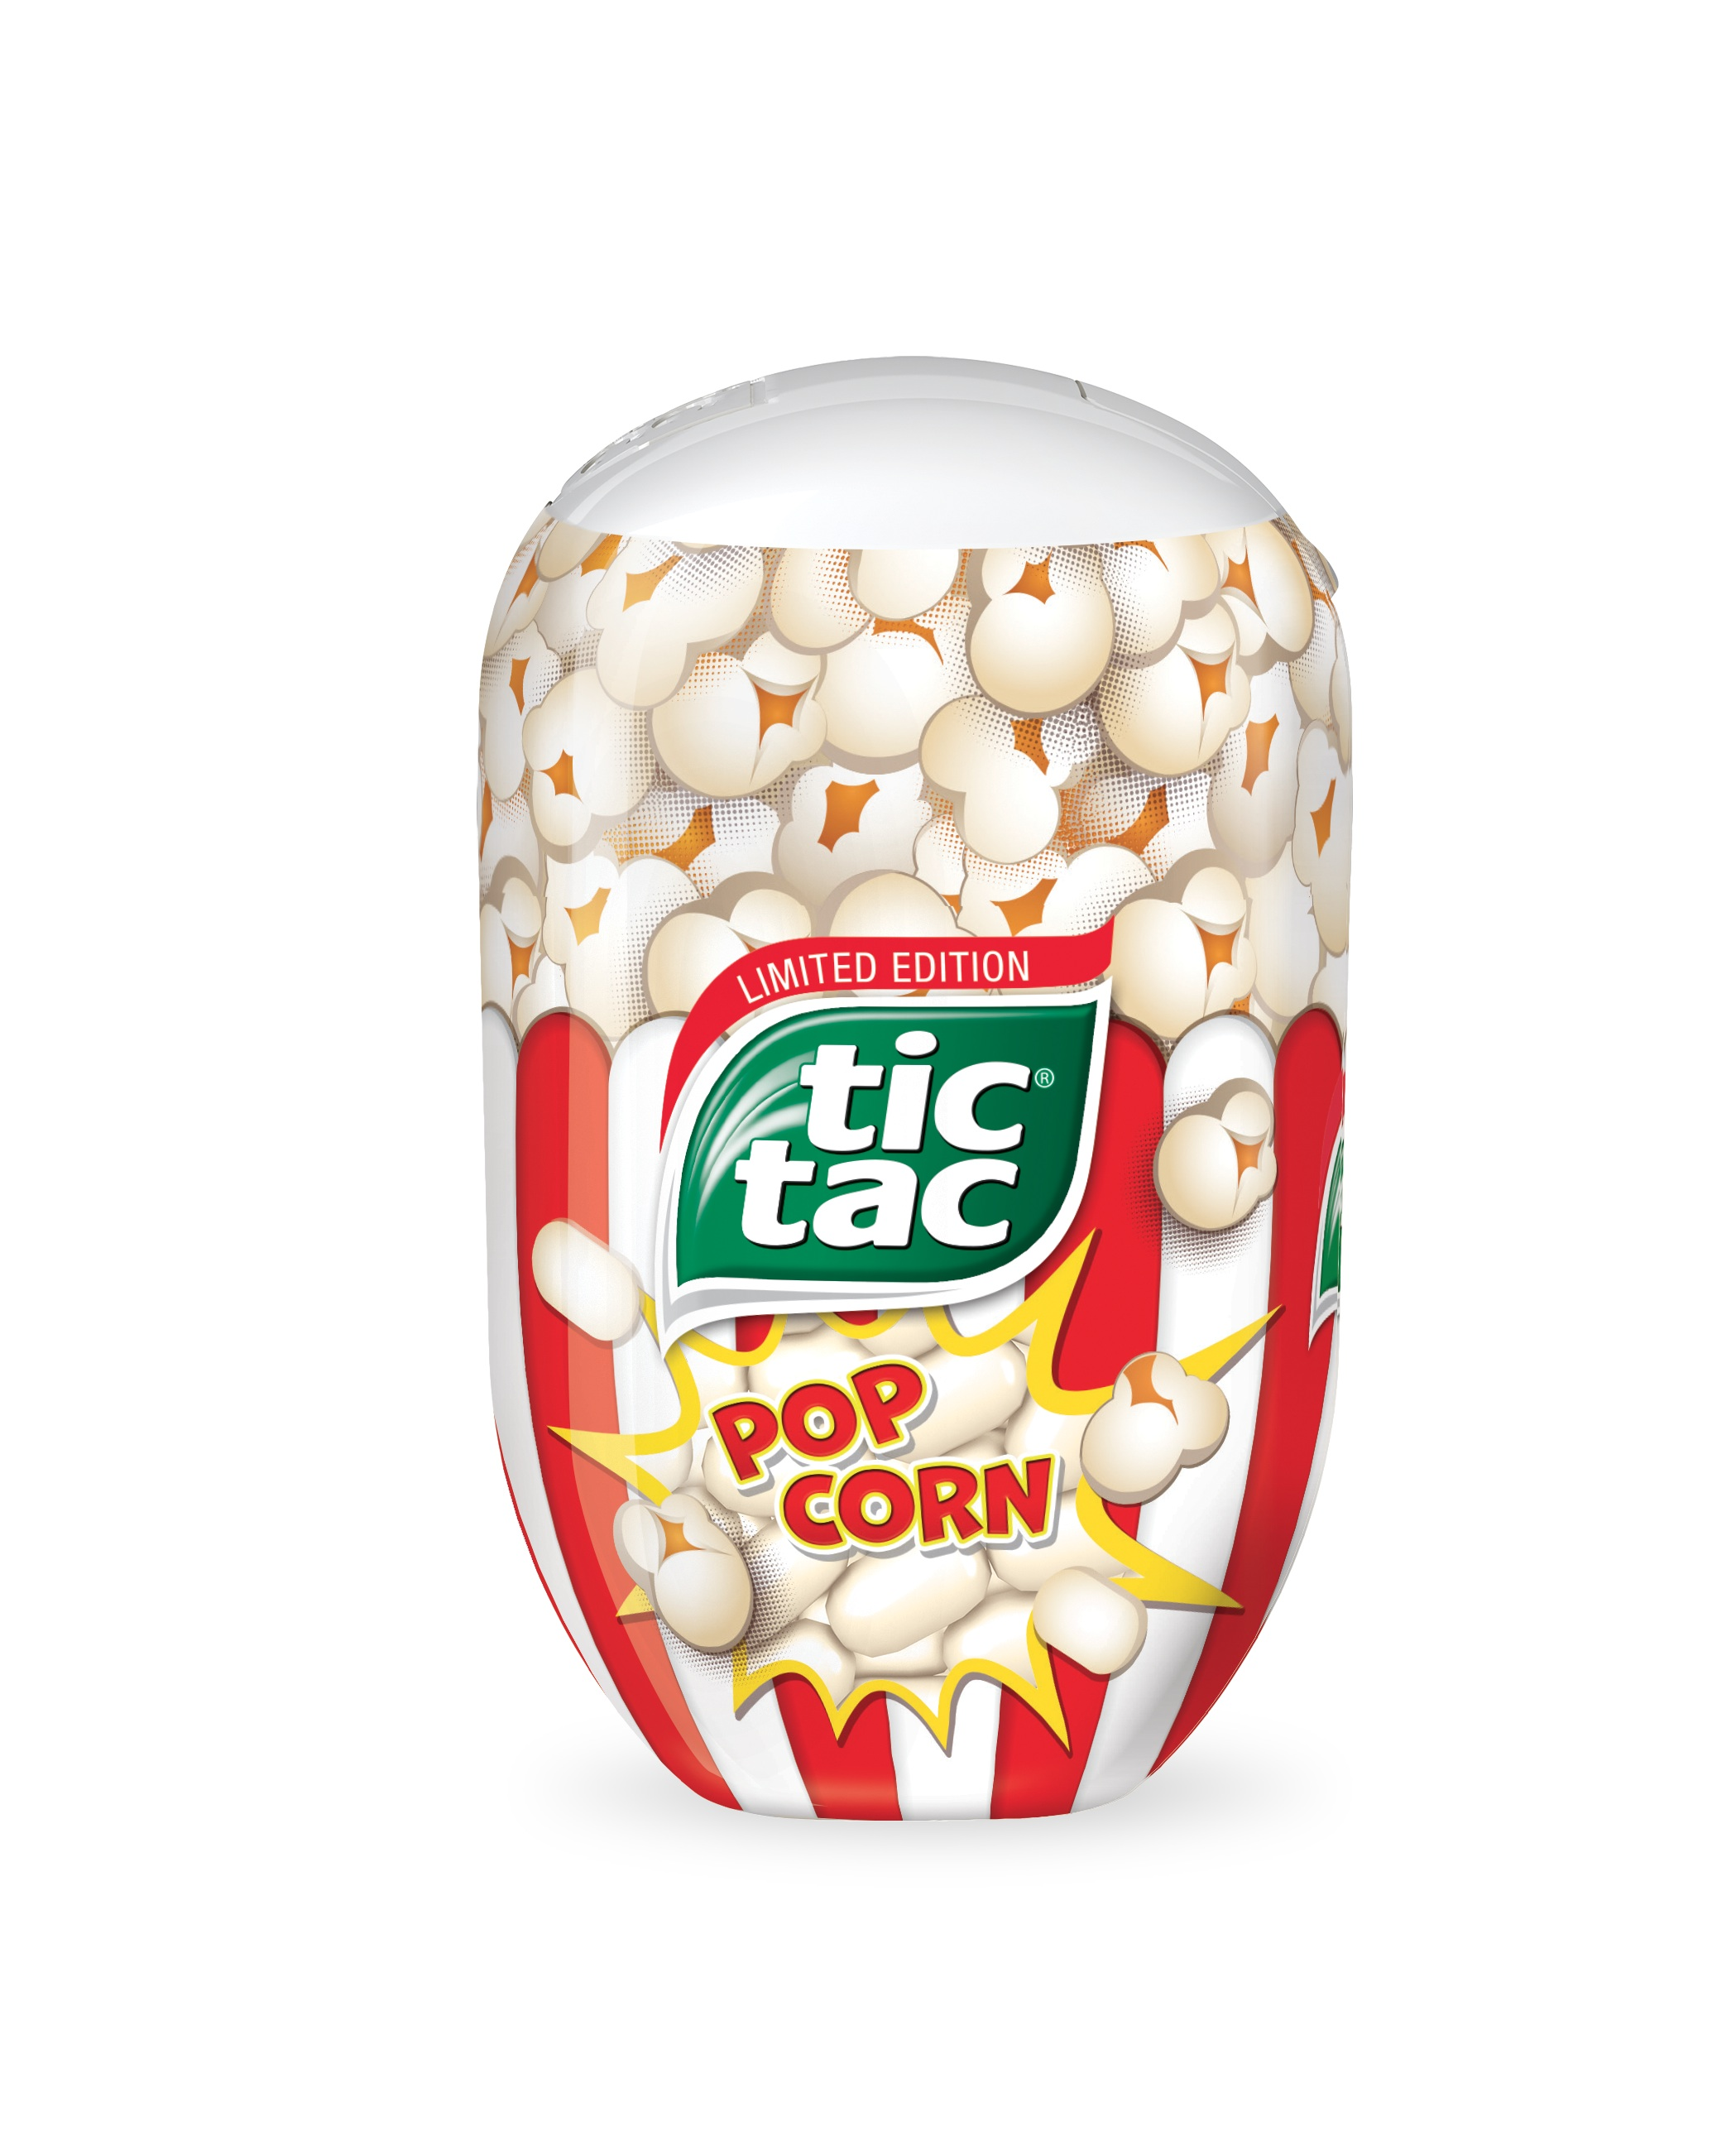 Arrivano i Tic Tac Pop Corn in edizione limitata